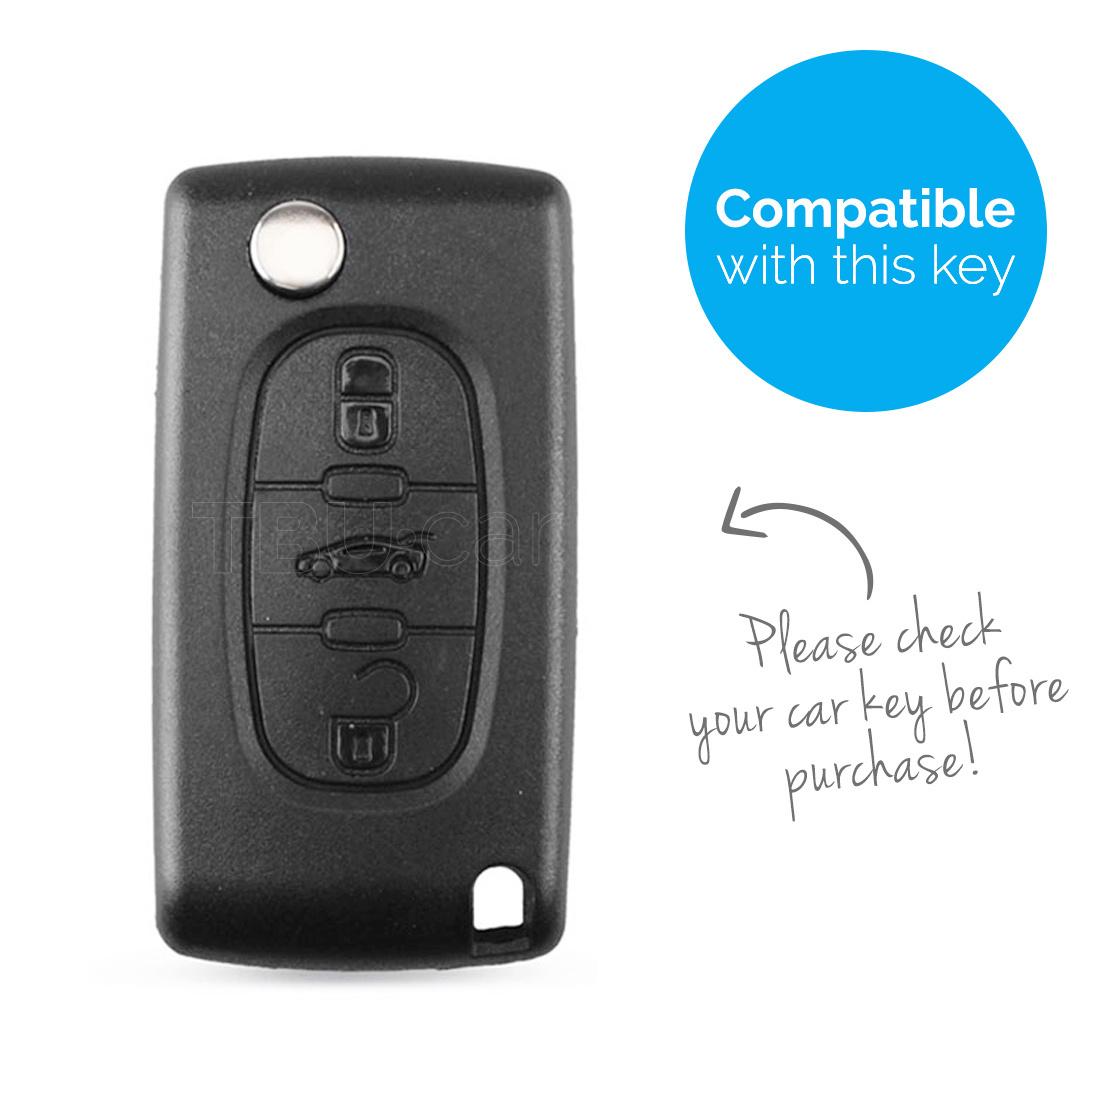 TBU car TBU car Sleutel cover compatibel met Peugeot - Silicone sleutelhoesje - beschermhoesje autosleutel - Oranje